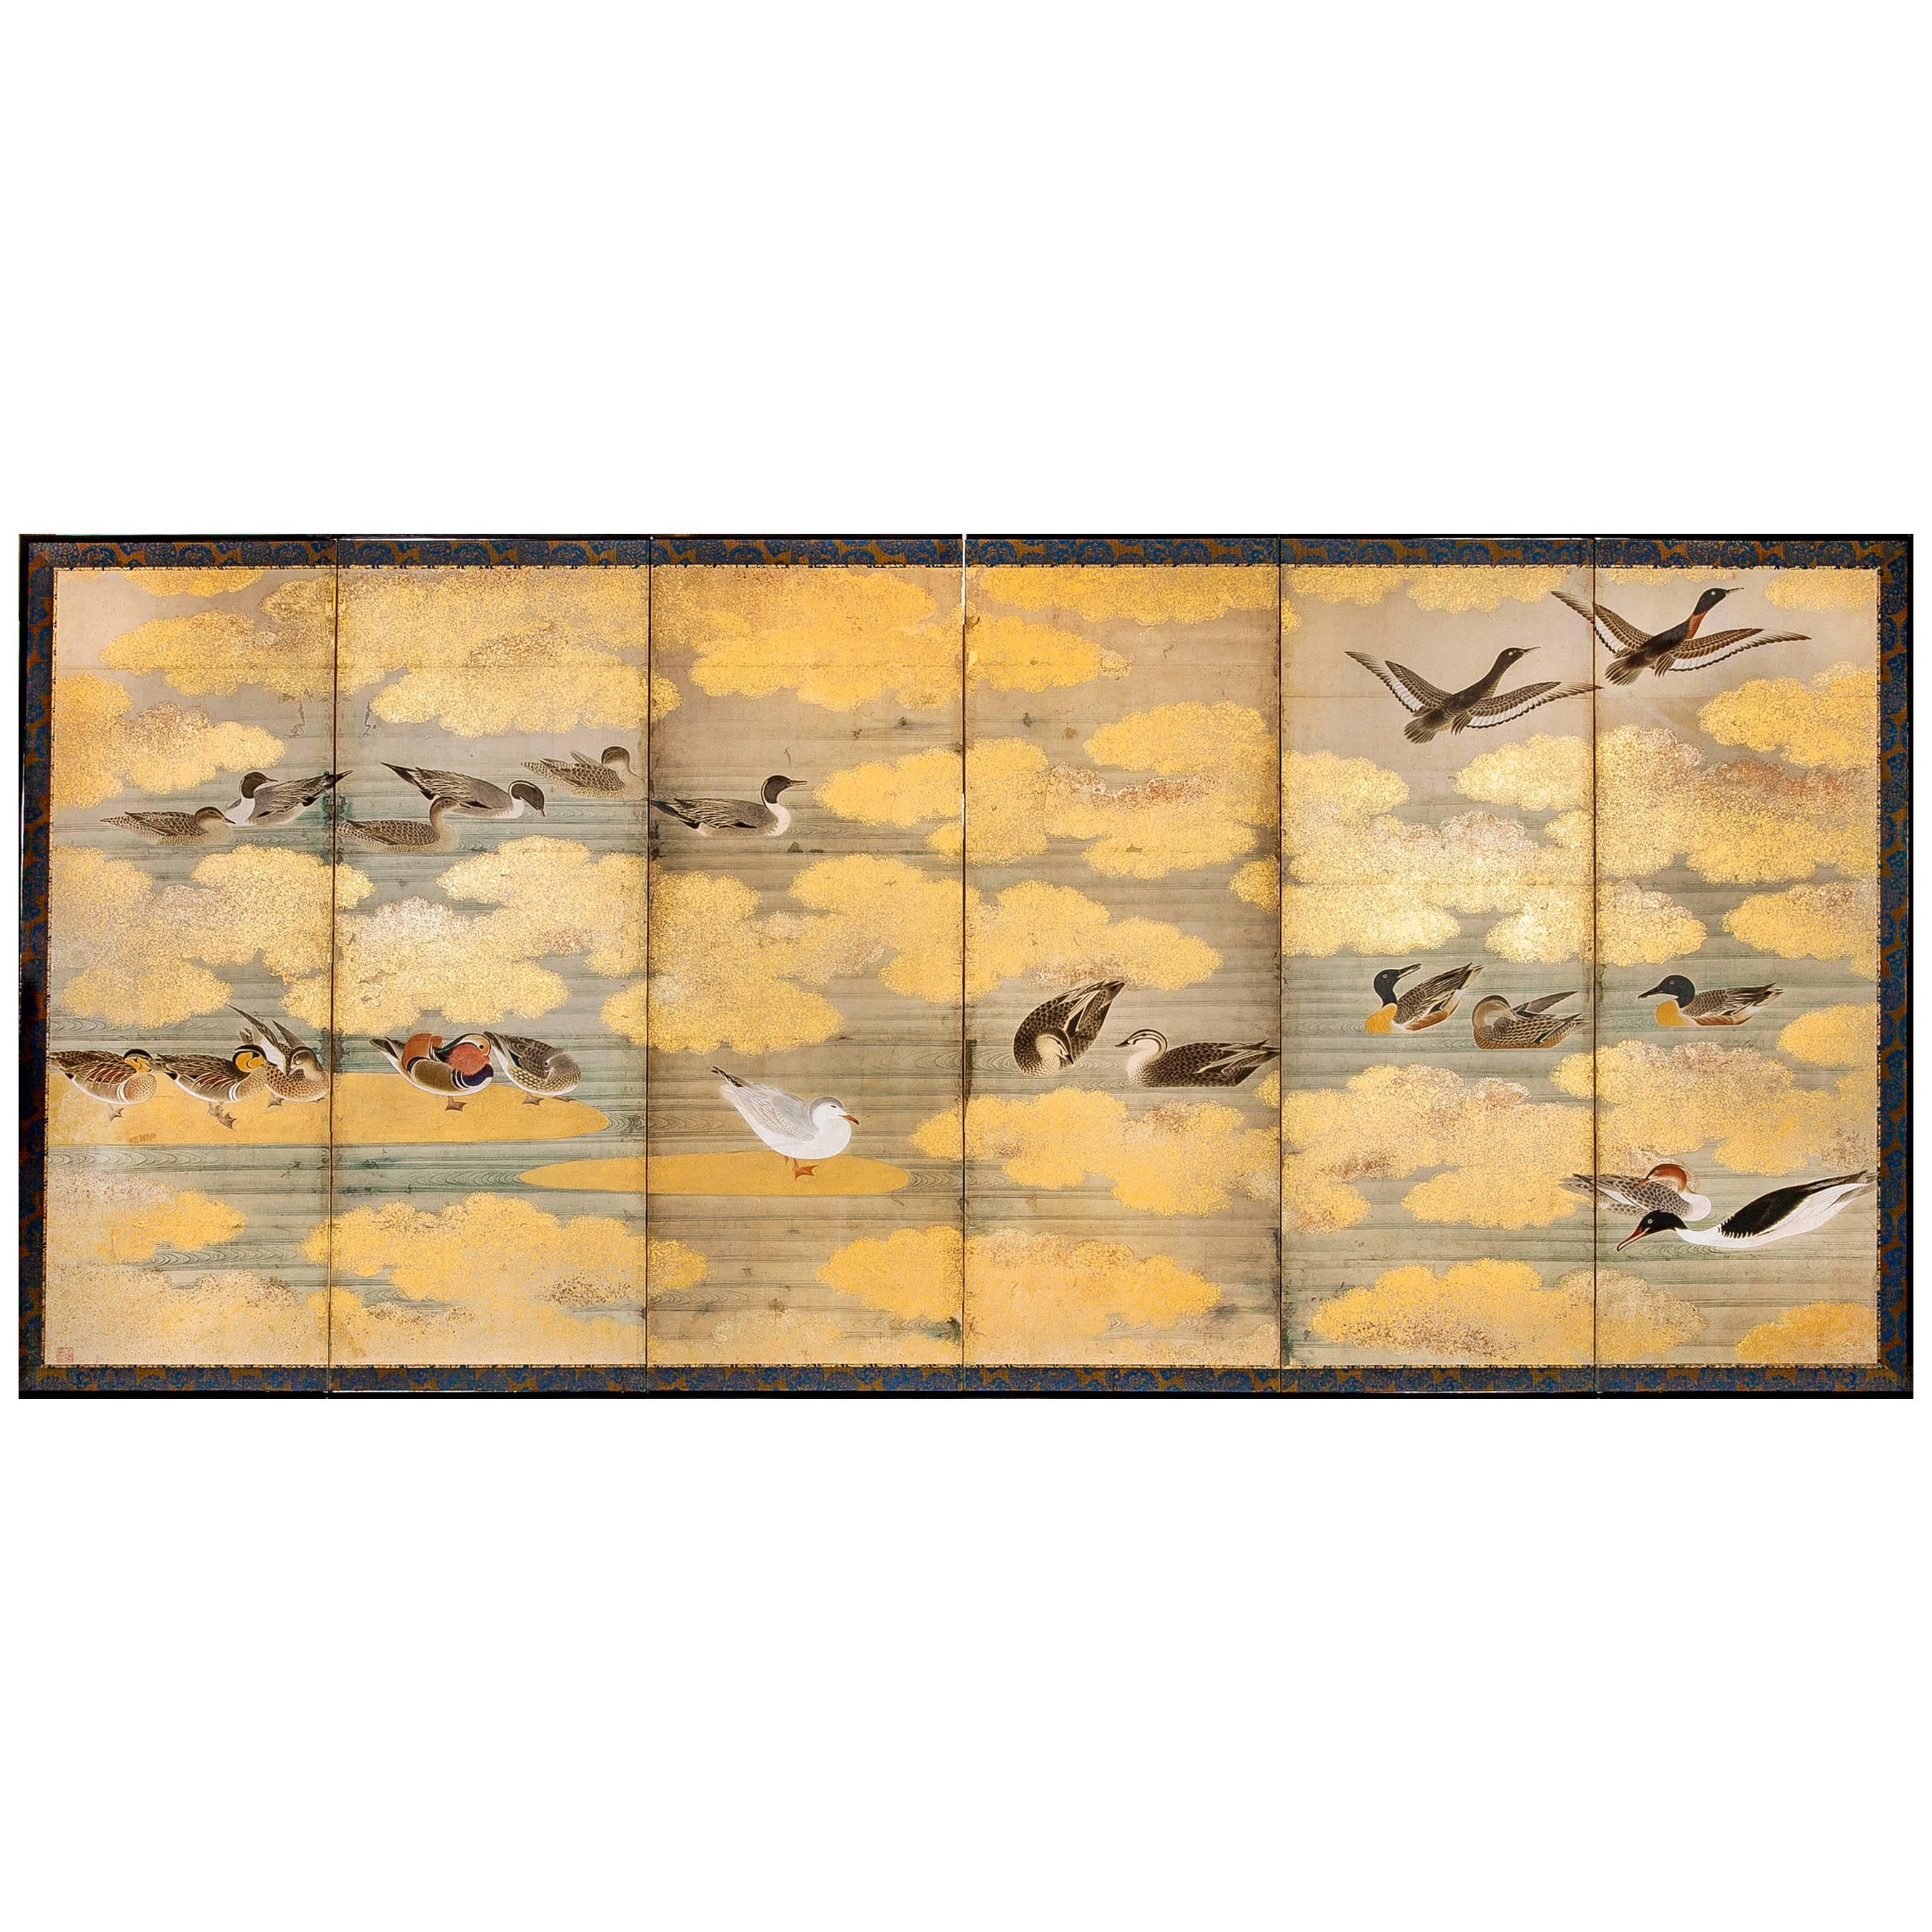 Japanese Six Panel Screen: Audubon Painting of Waterfowl